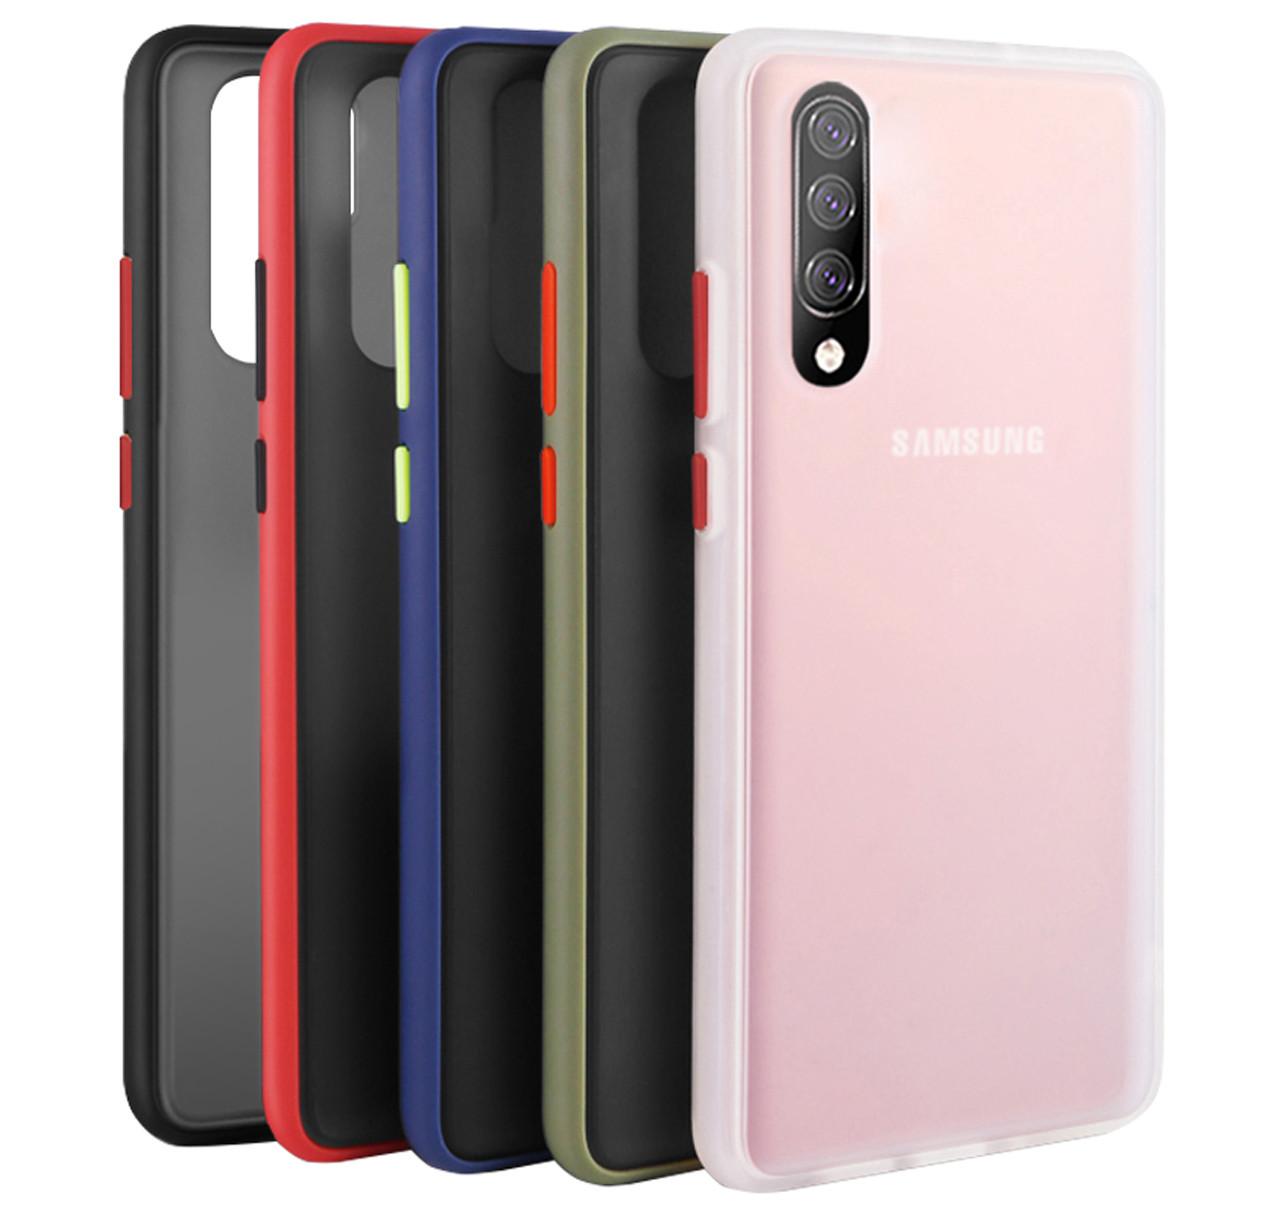 Чехол-накладка TPU+PC Color Buttons Shield для Samsung Galaxy A50 (2019) SM-A505F